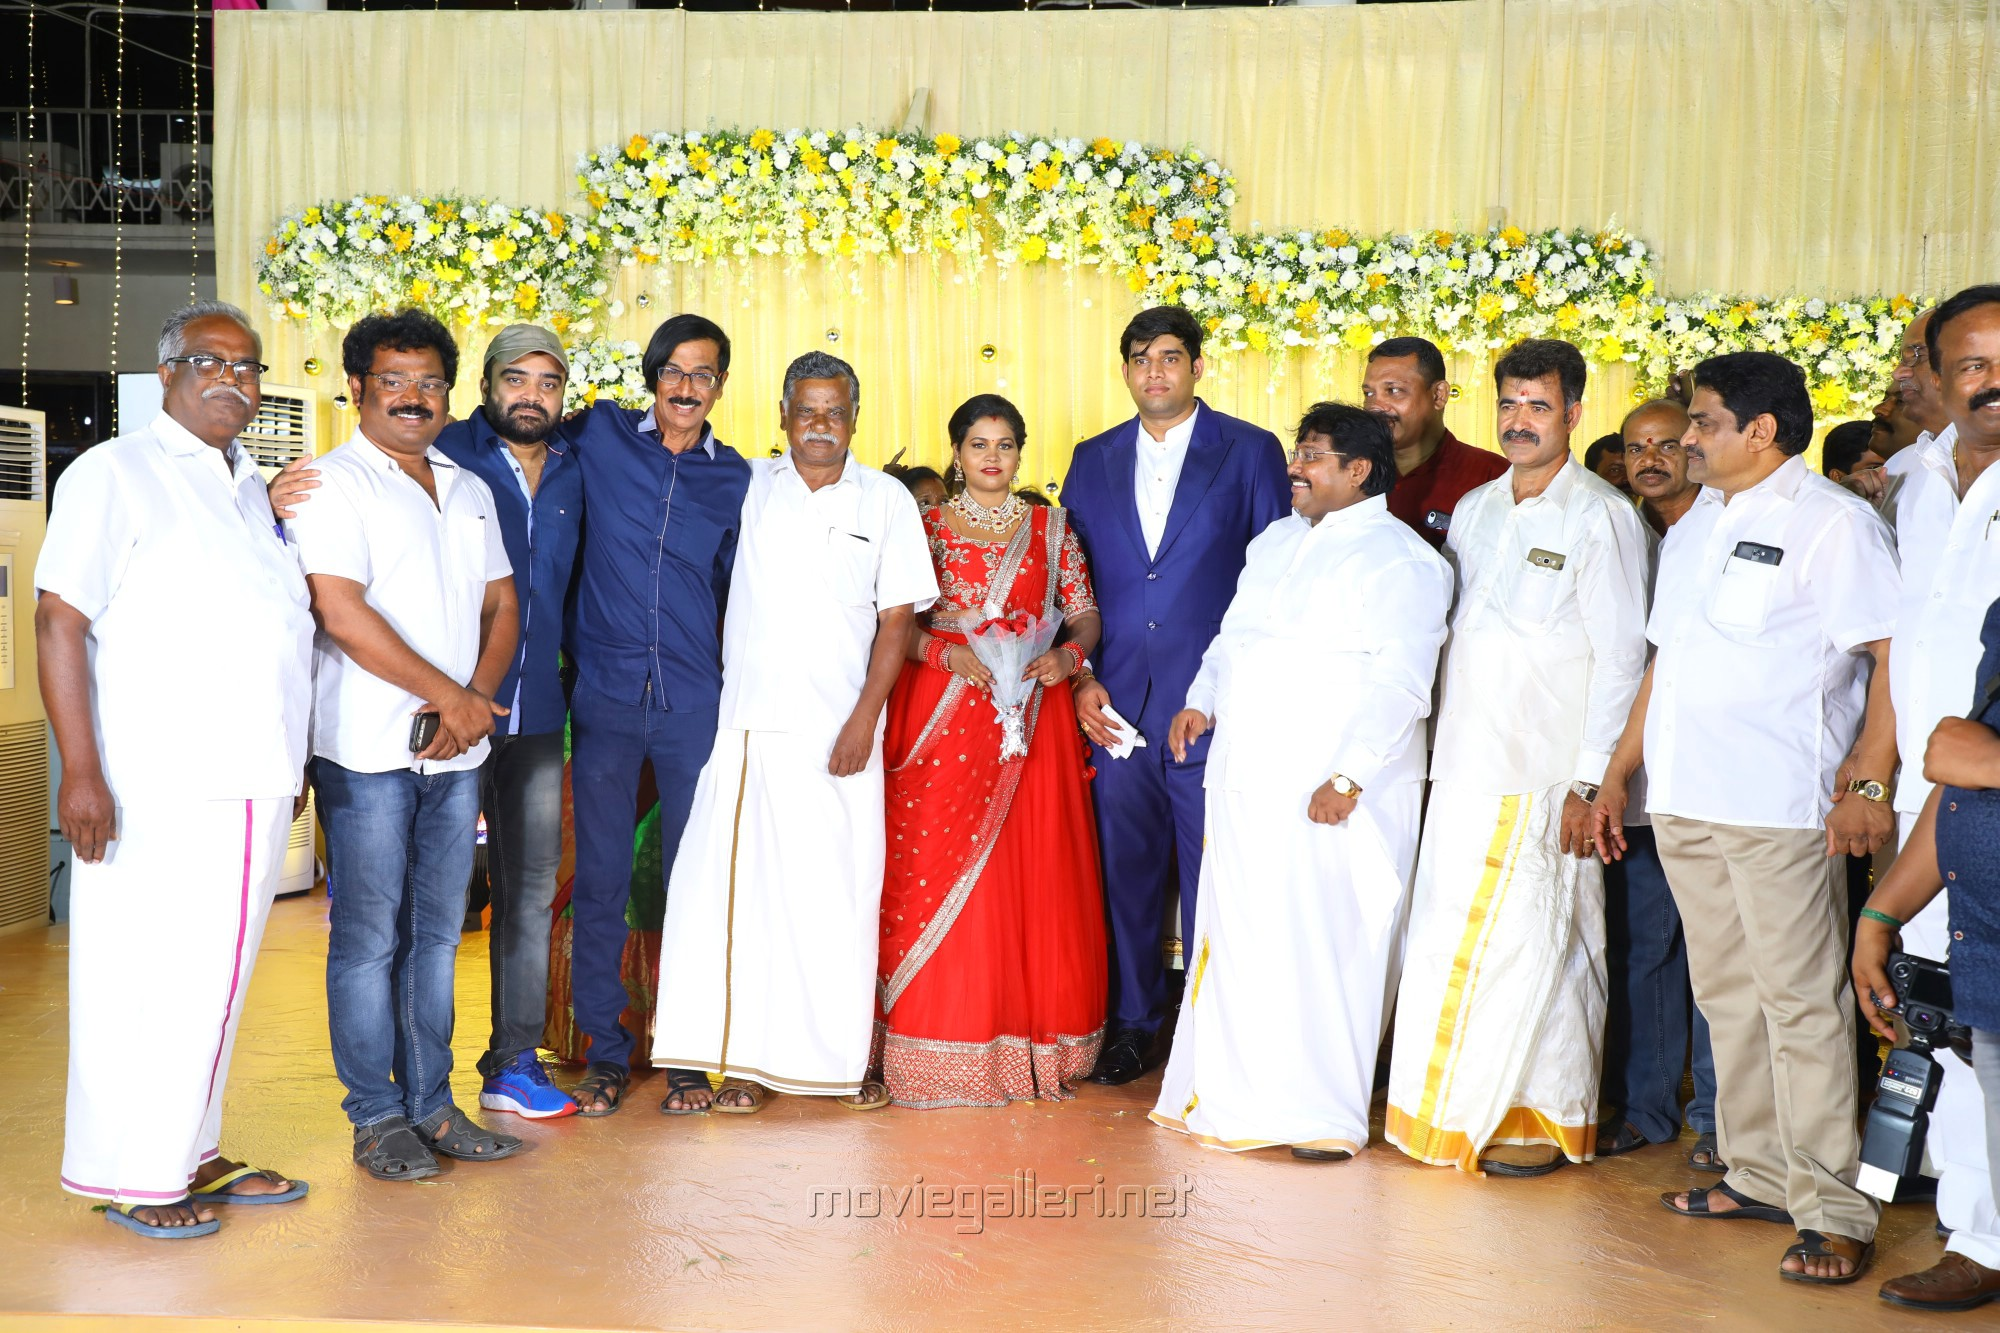 AL Udhaya, Manobala @ Salem RR Briyani Tamilselvan daughter Wedding Reception Stills